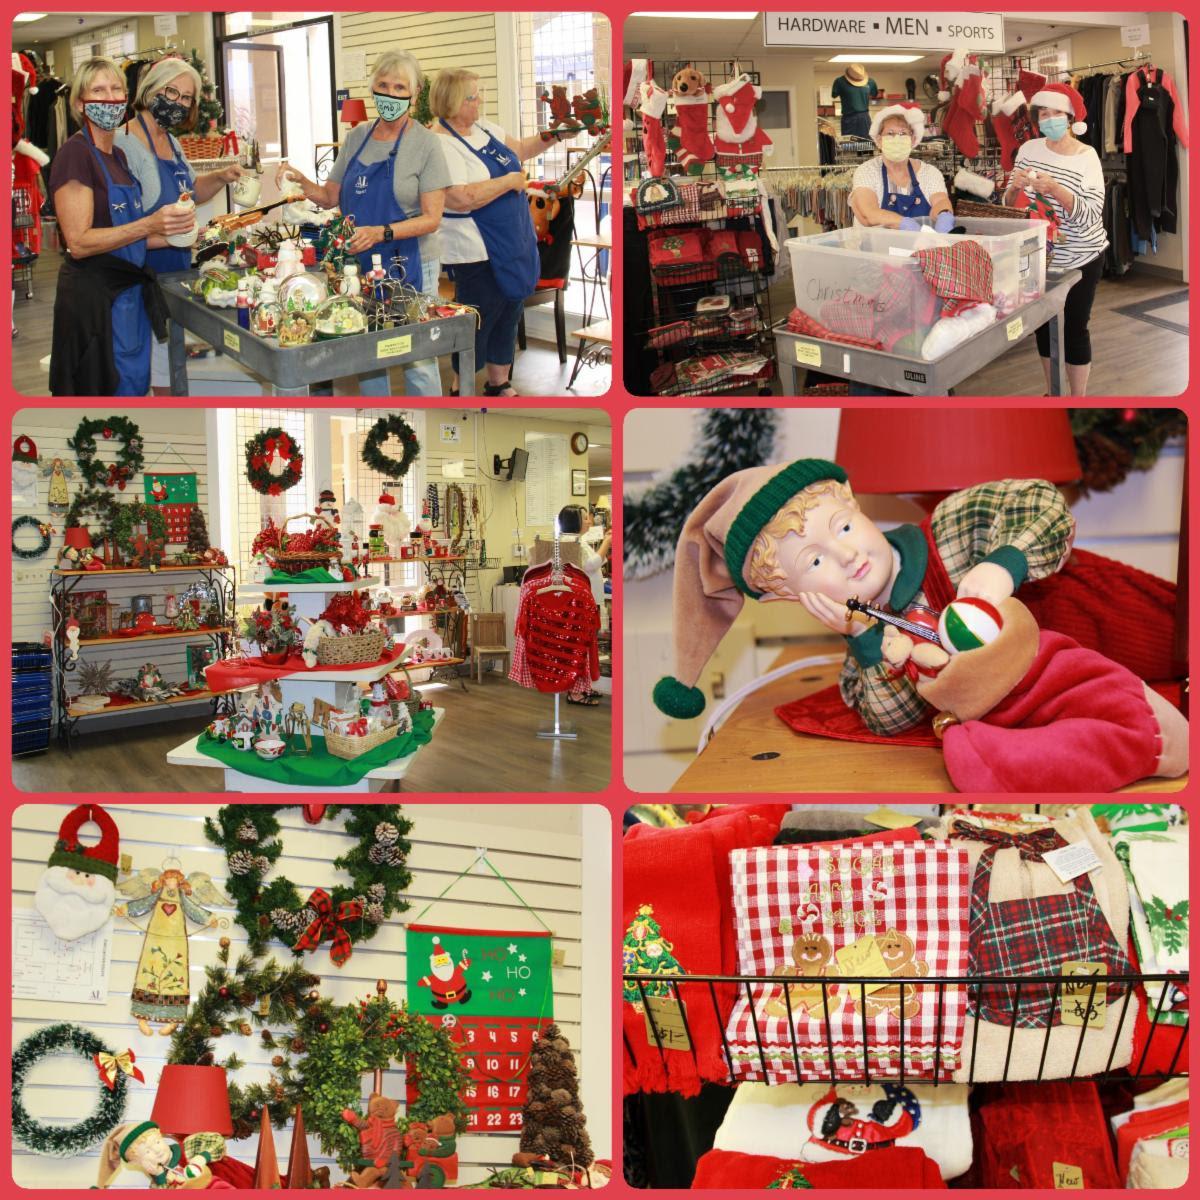 Christmas Assistance Programs List 2020 Huntington Beach Ca Thrift Shop Open Wed & Sat as of Aug. 12, 2020 | Assistance League